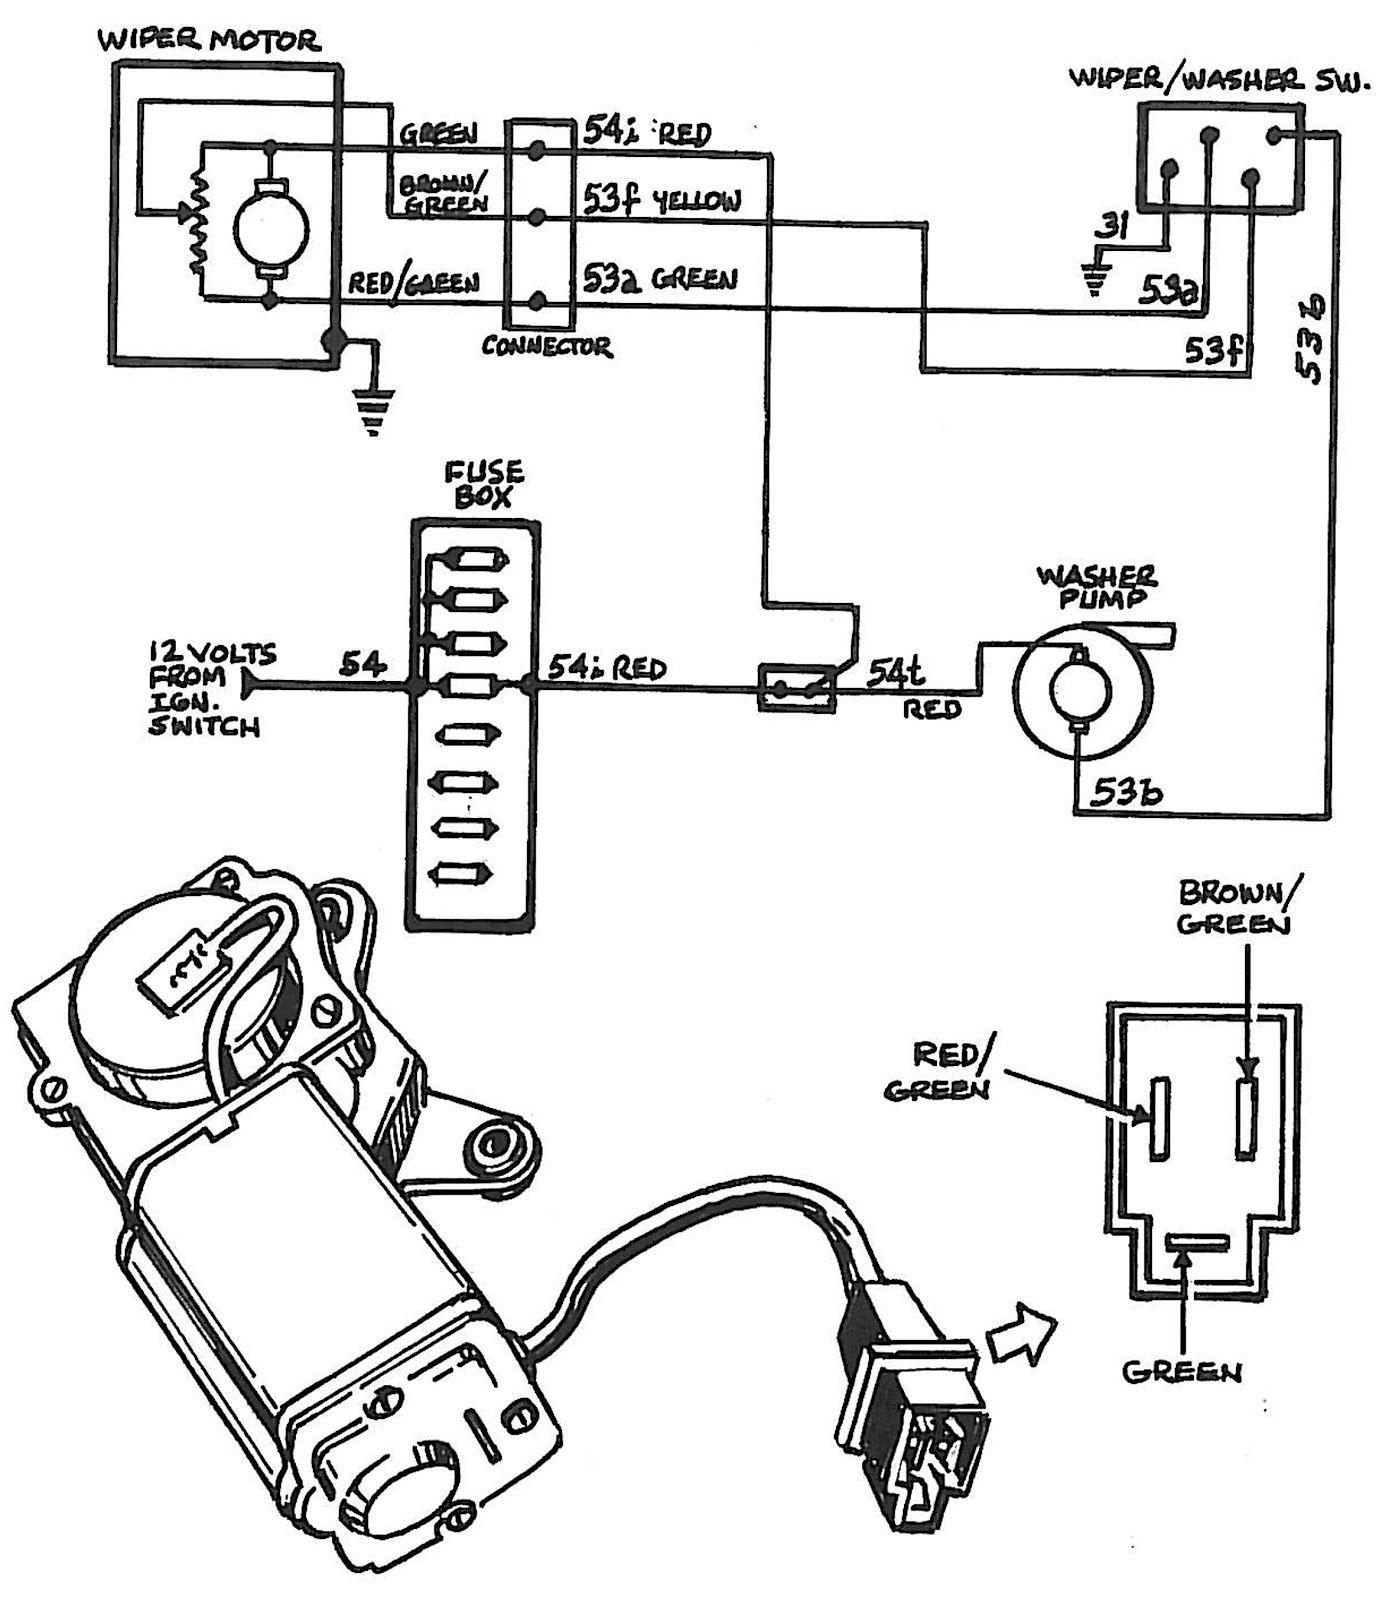 1992 corvette wiper wiring diagram - fusebox and wiring diagram schematic-paint  - schematic-paint.parliamoneassieme.it  schematic-paint.parliamoneassieme.it